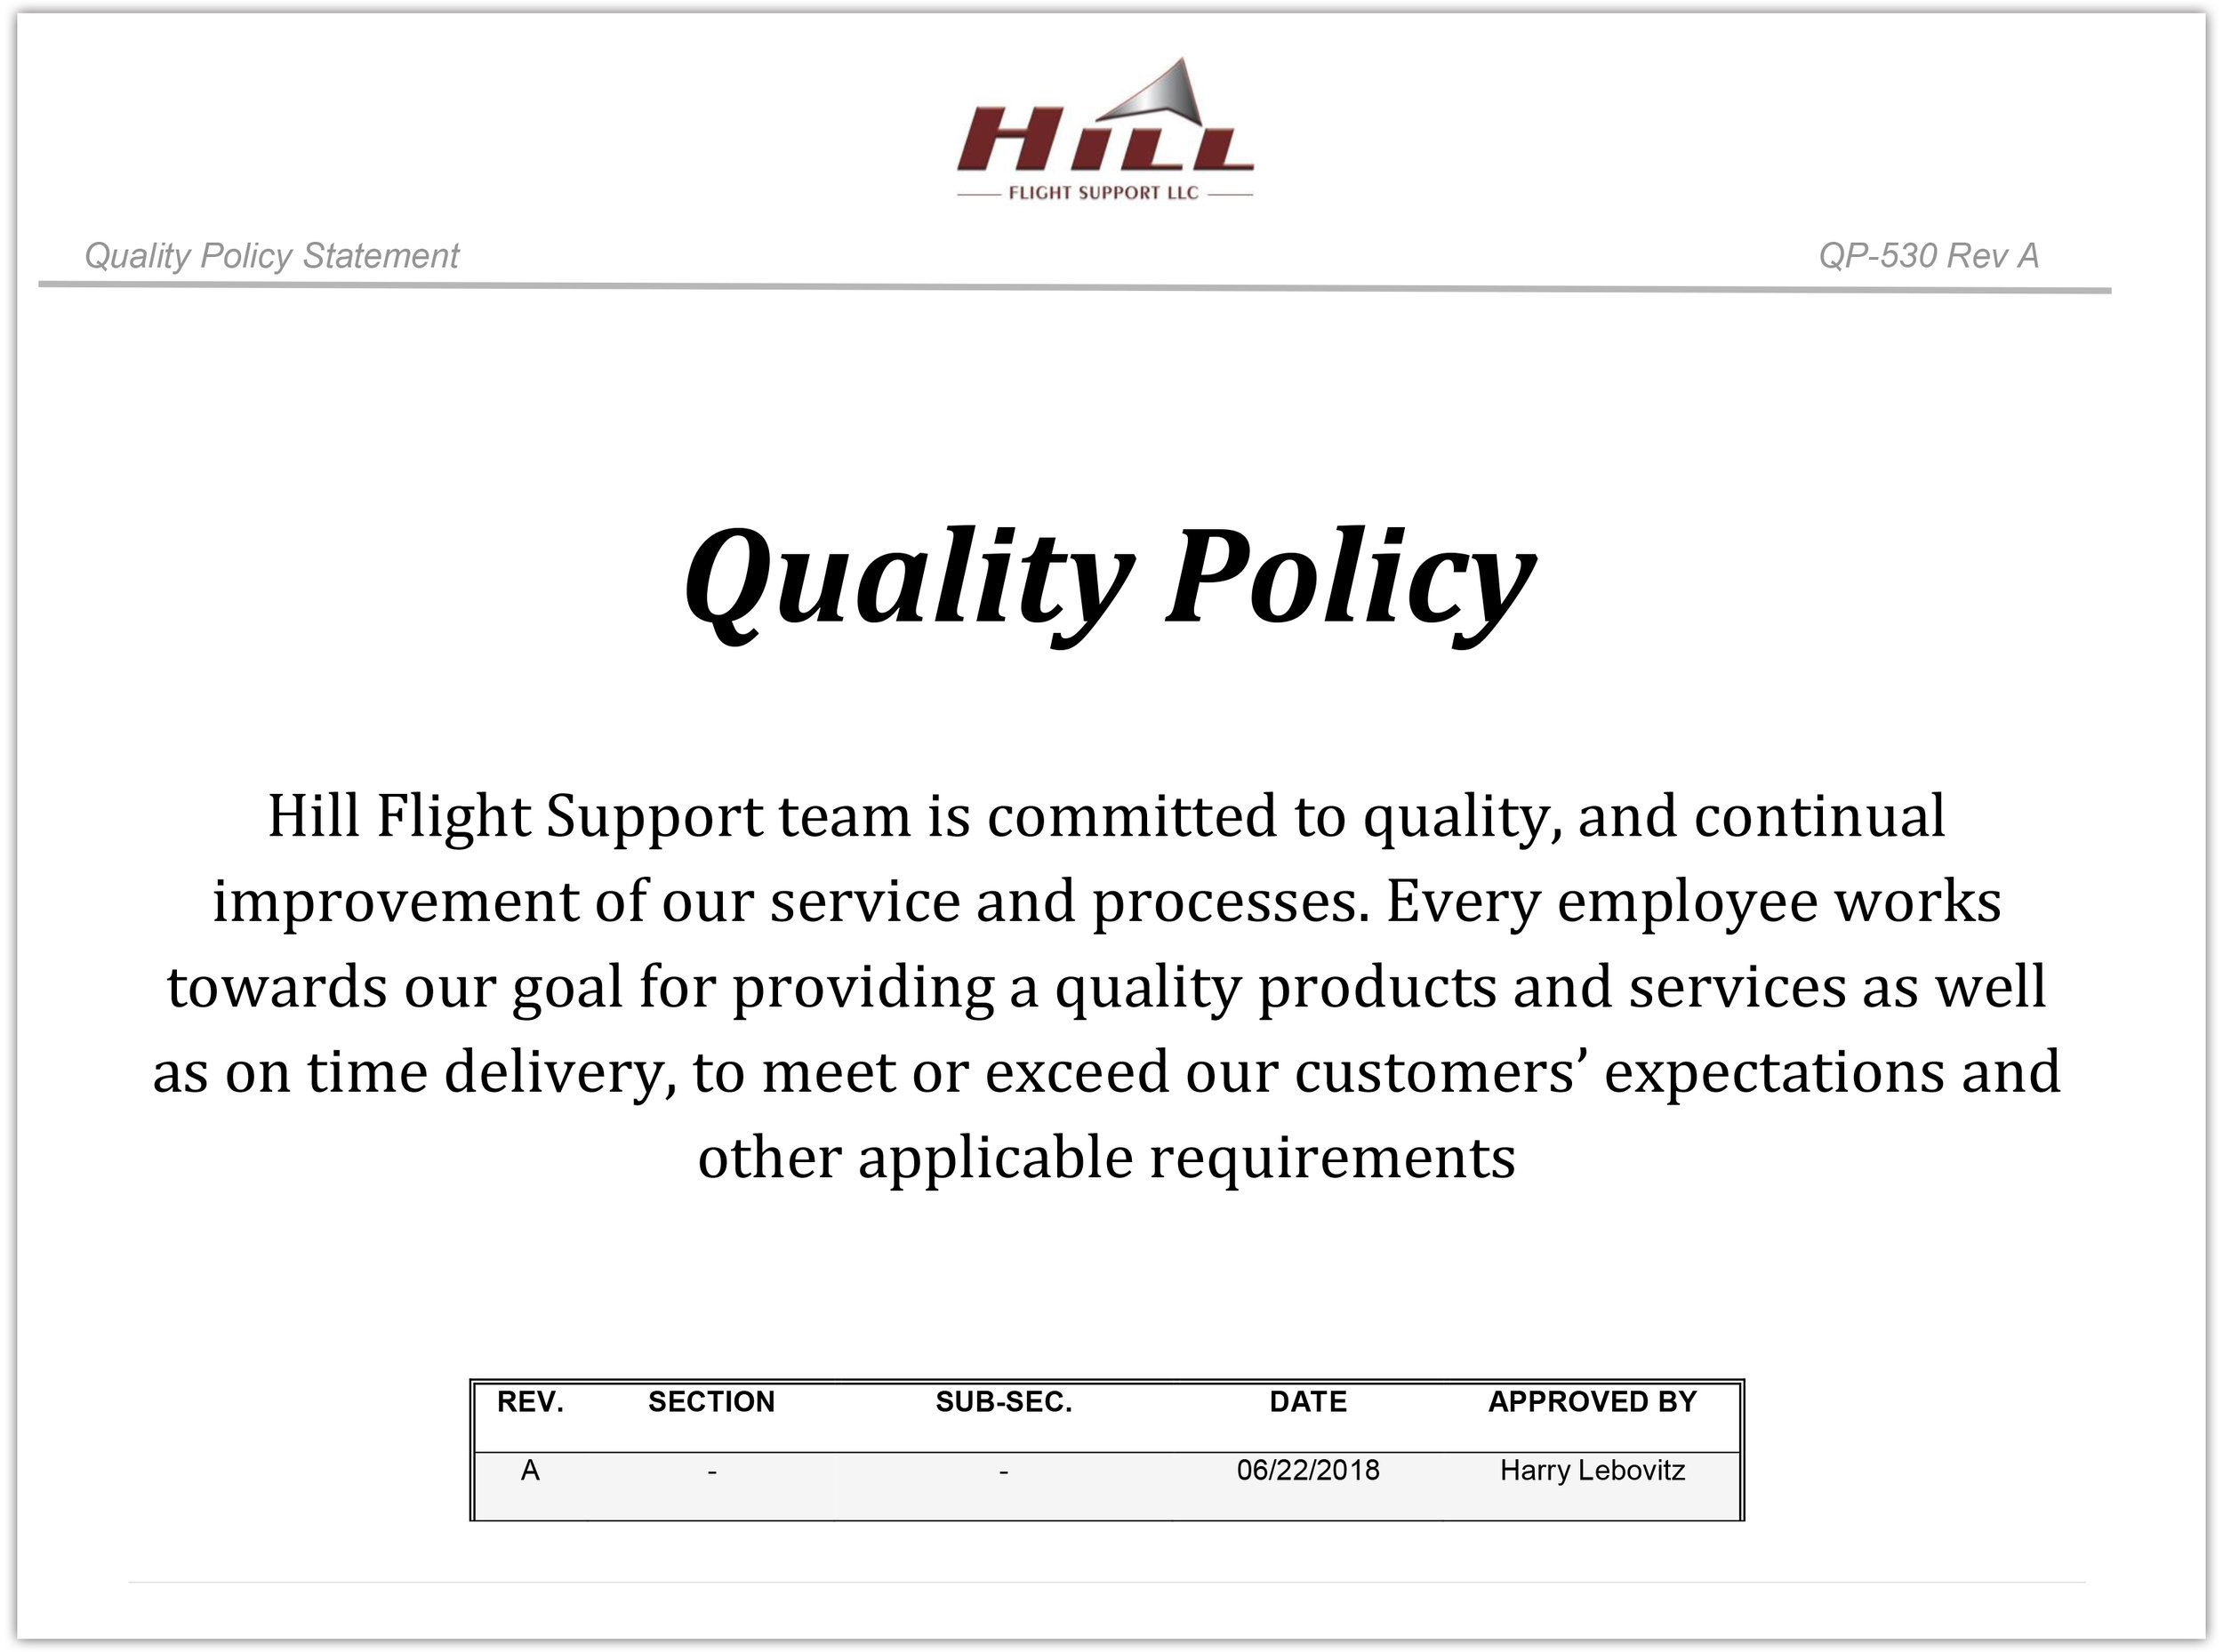 QP-530 Rev A-Quality Policy.jpg